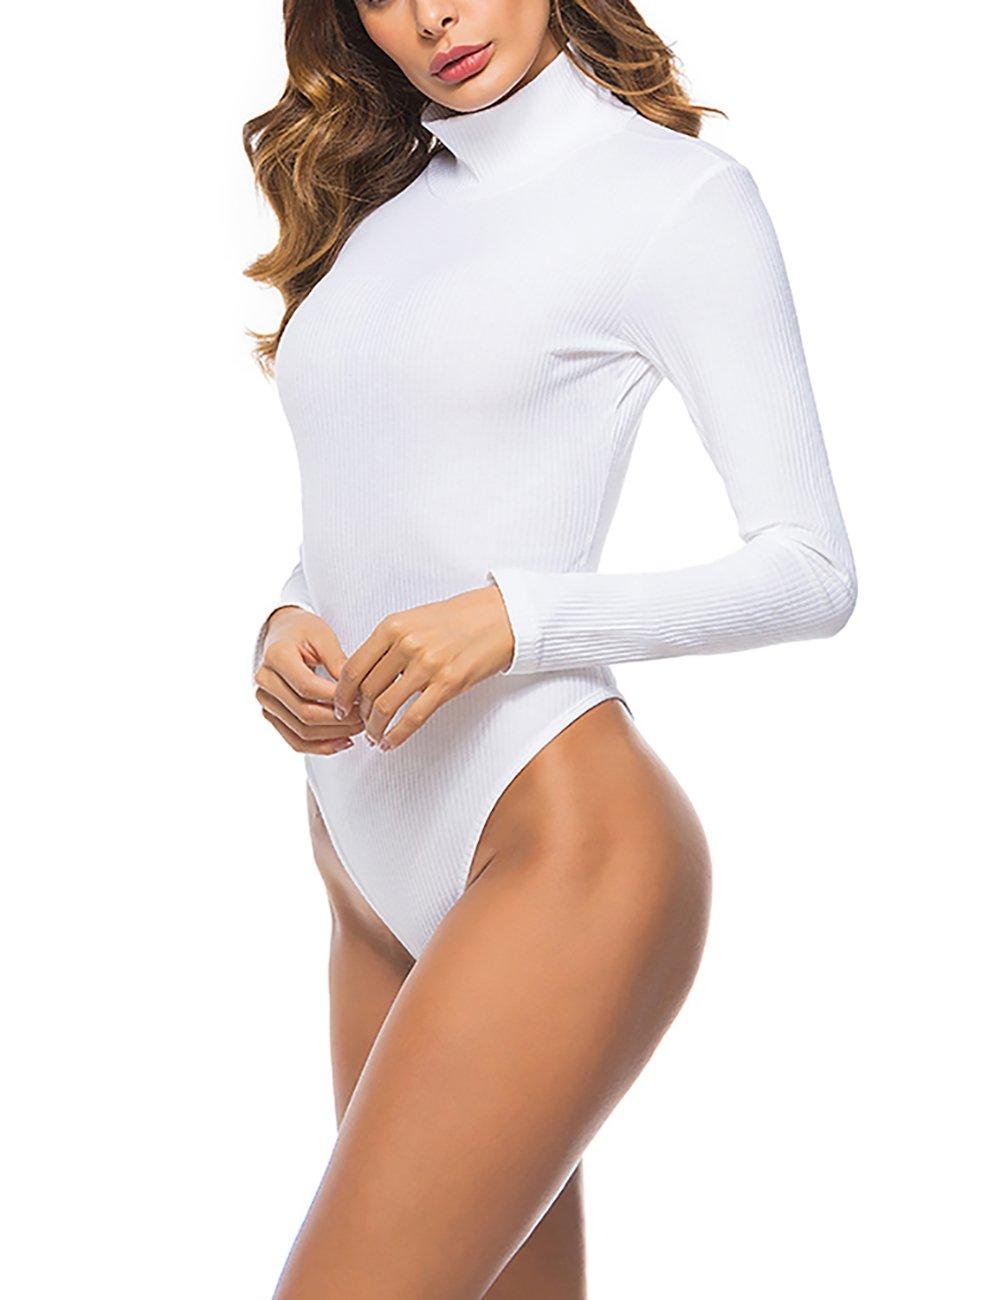 Queen.M Women's Basic Solid Bodysuit Turtleneck Leotard Top Long Sleeve Bodycon Jumpsuit Stretchy Romper